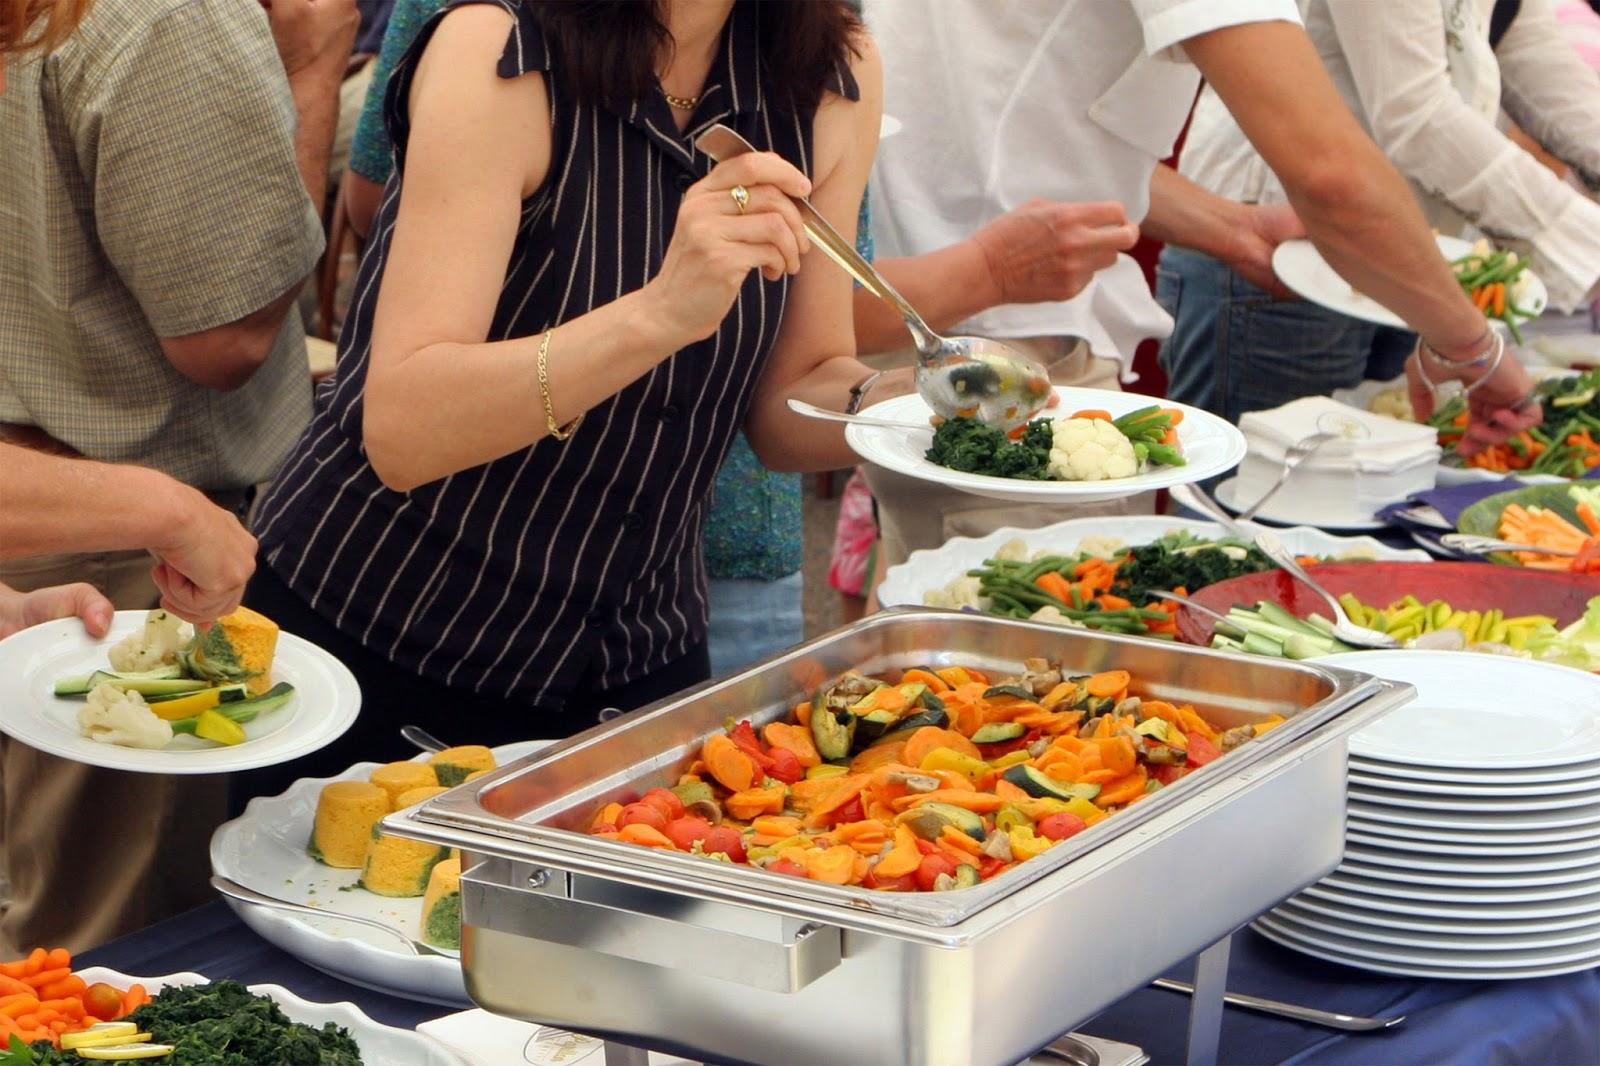 chafing Dish, bufet, evenimente, hotel, restaurante, mic dejun, bufet suedez